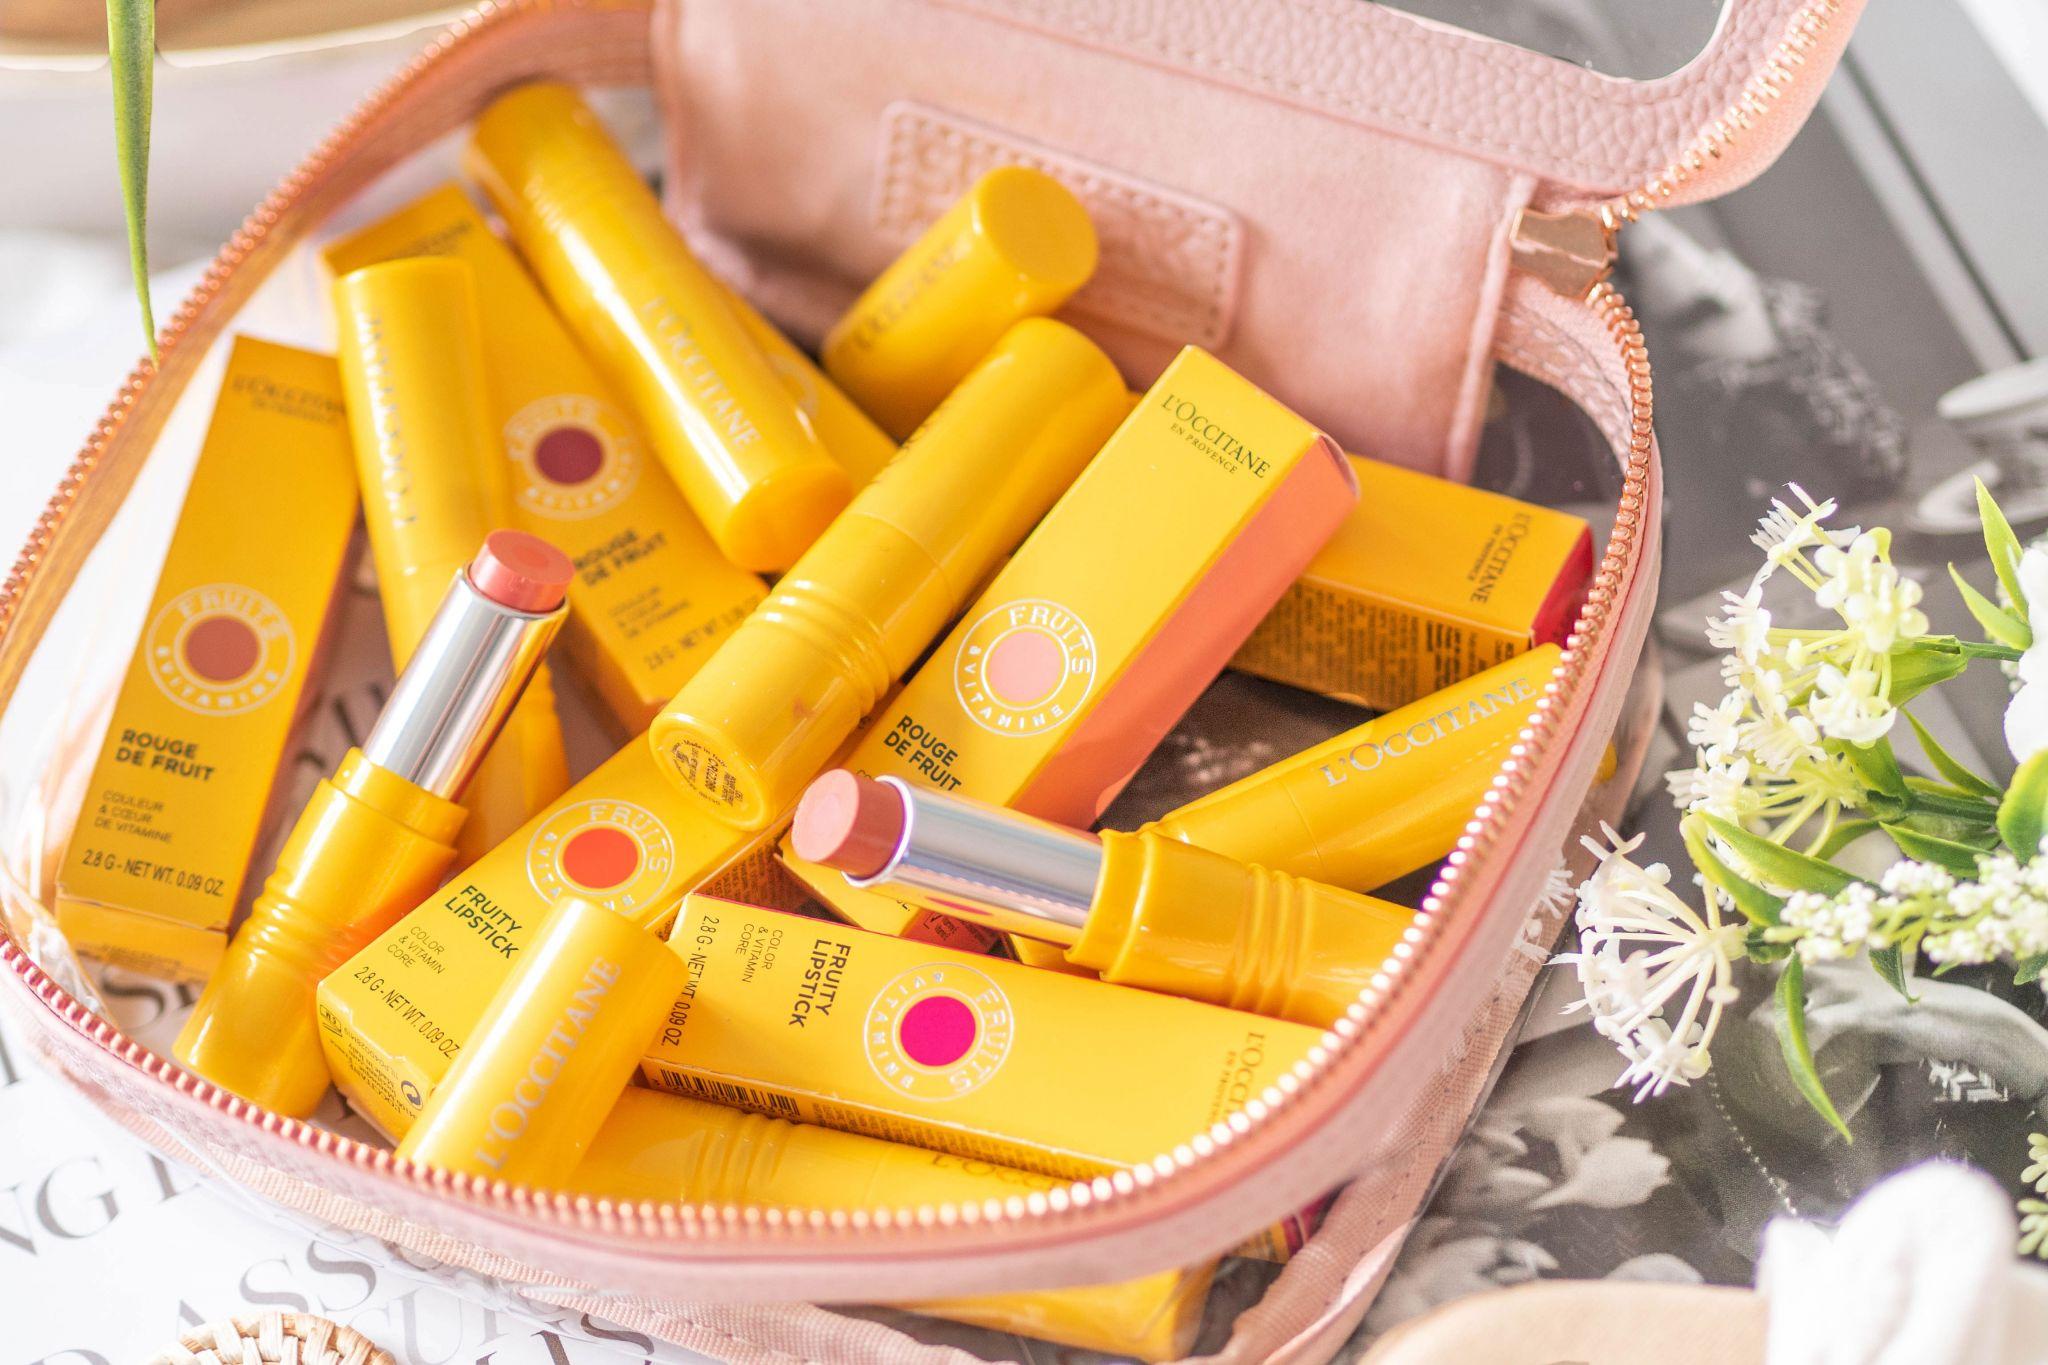 L'Occitane Fruity lipstick review